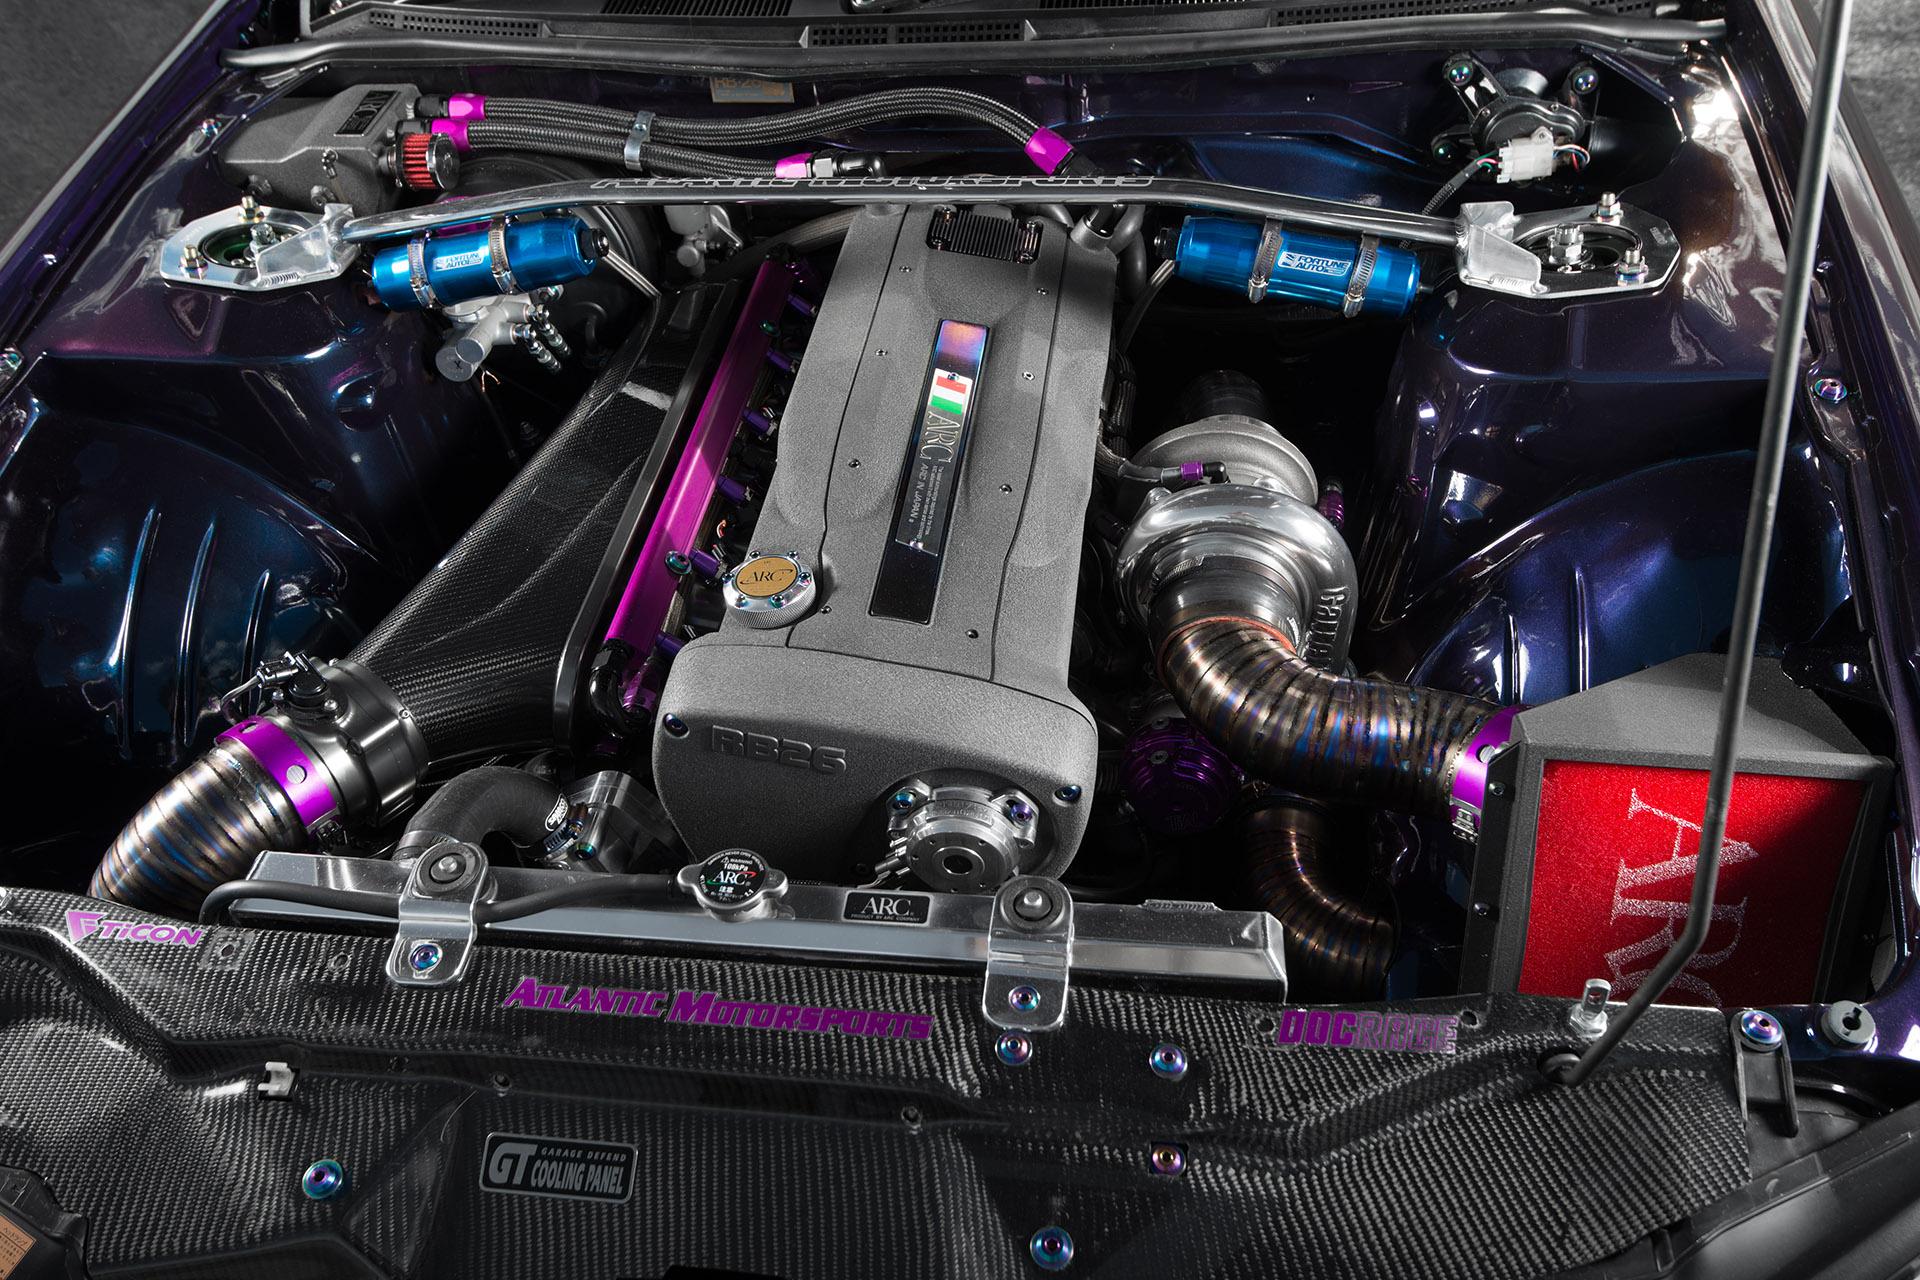 Nissan RB26DETT engine swap in Midnight Purple III S15 Silvia Super Street magazine engine bay automotive photography